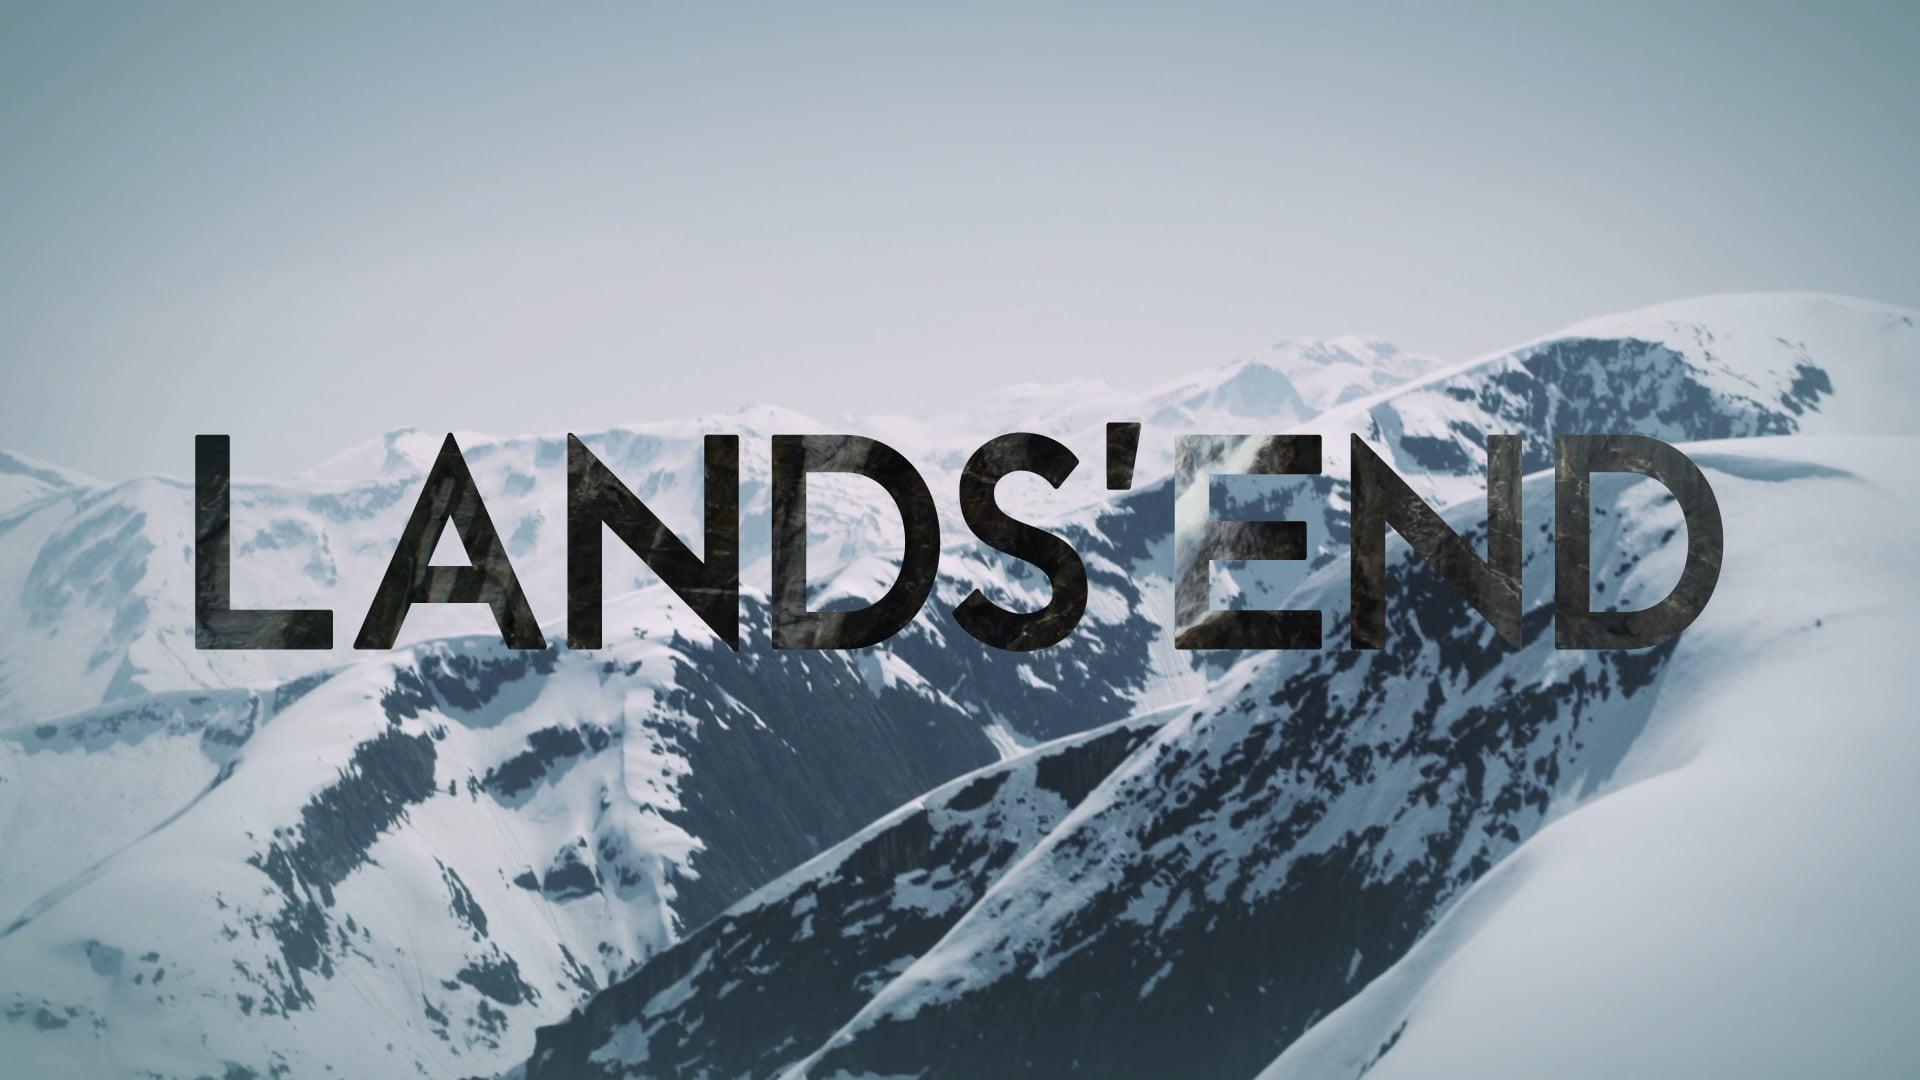 Land's End, Alaska